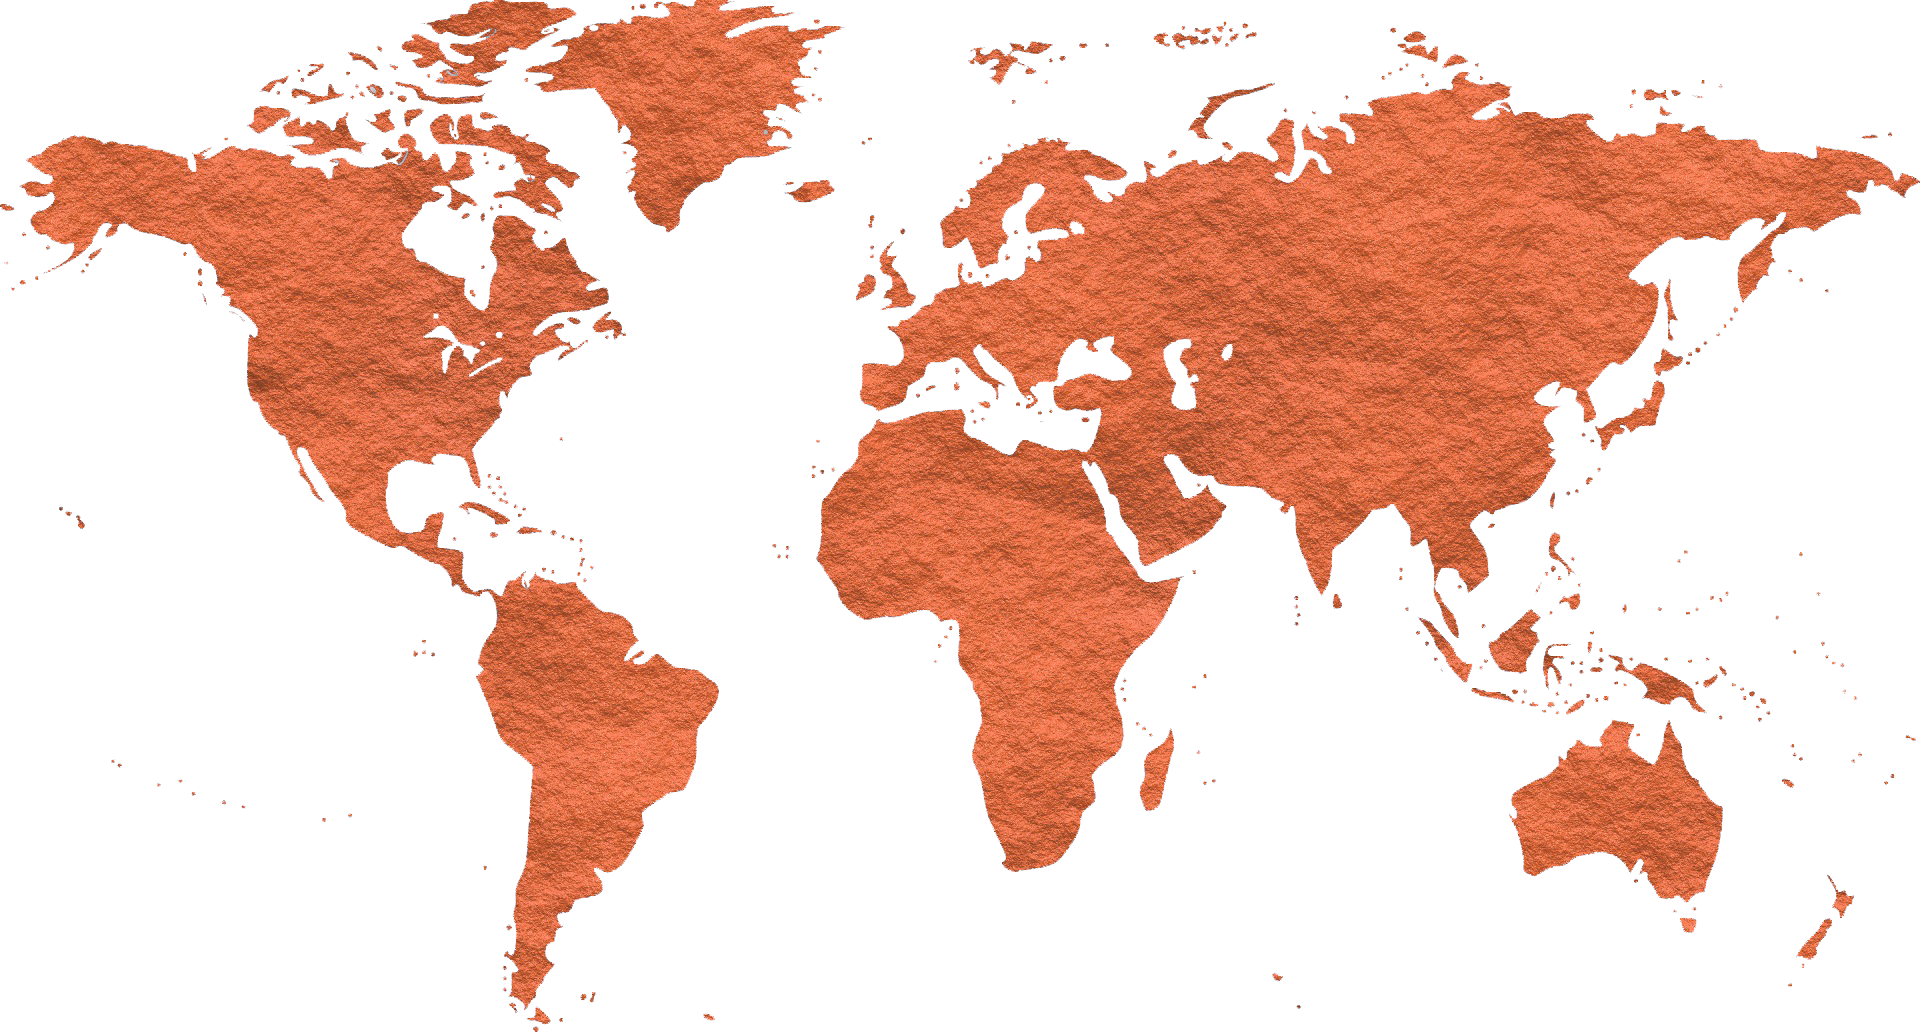 worldsmap